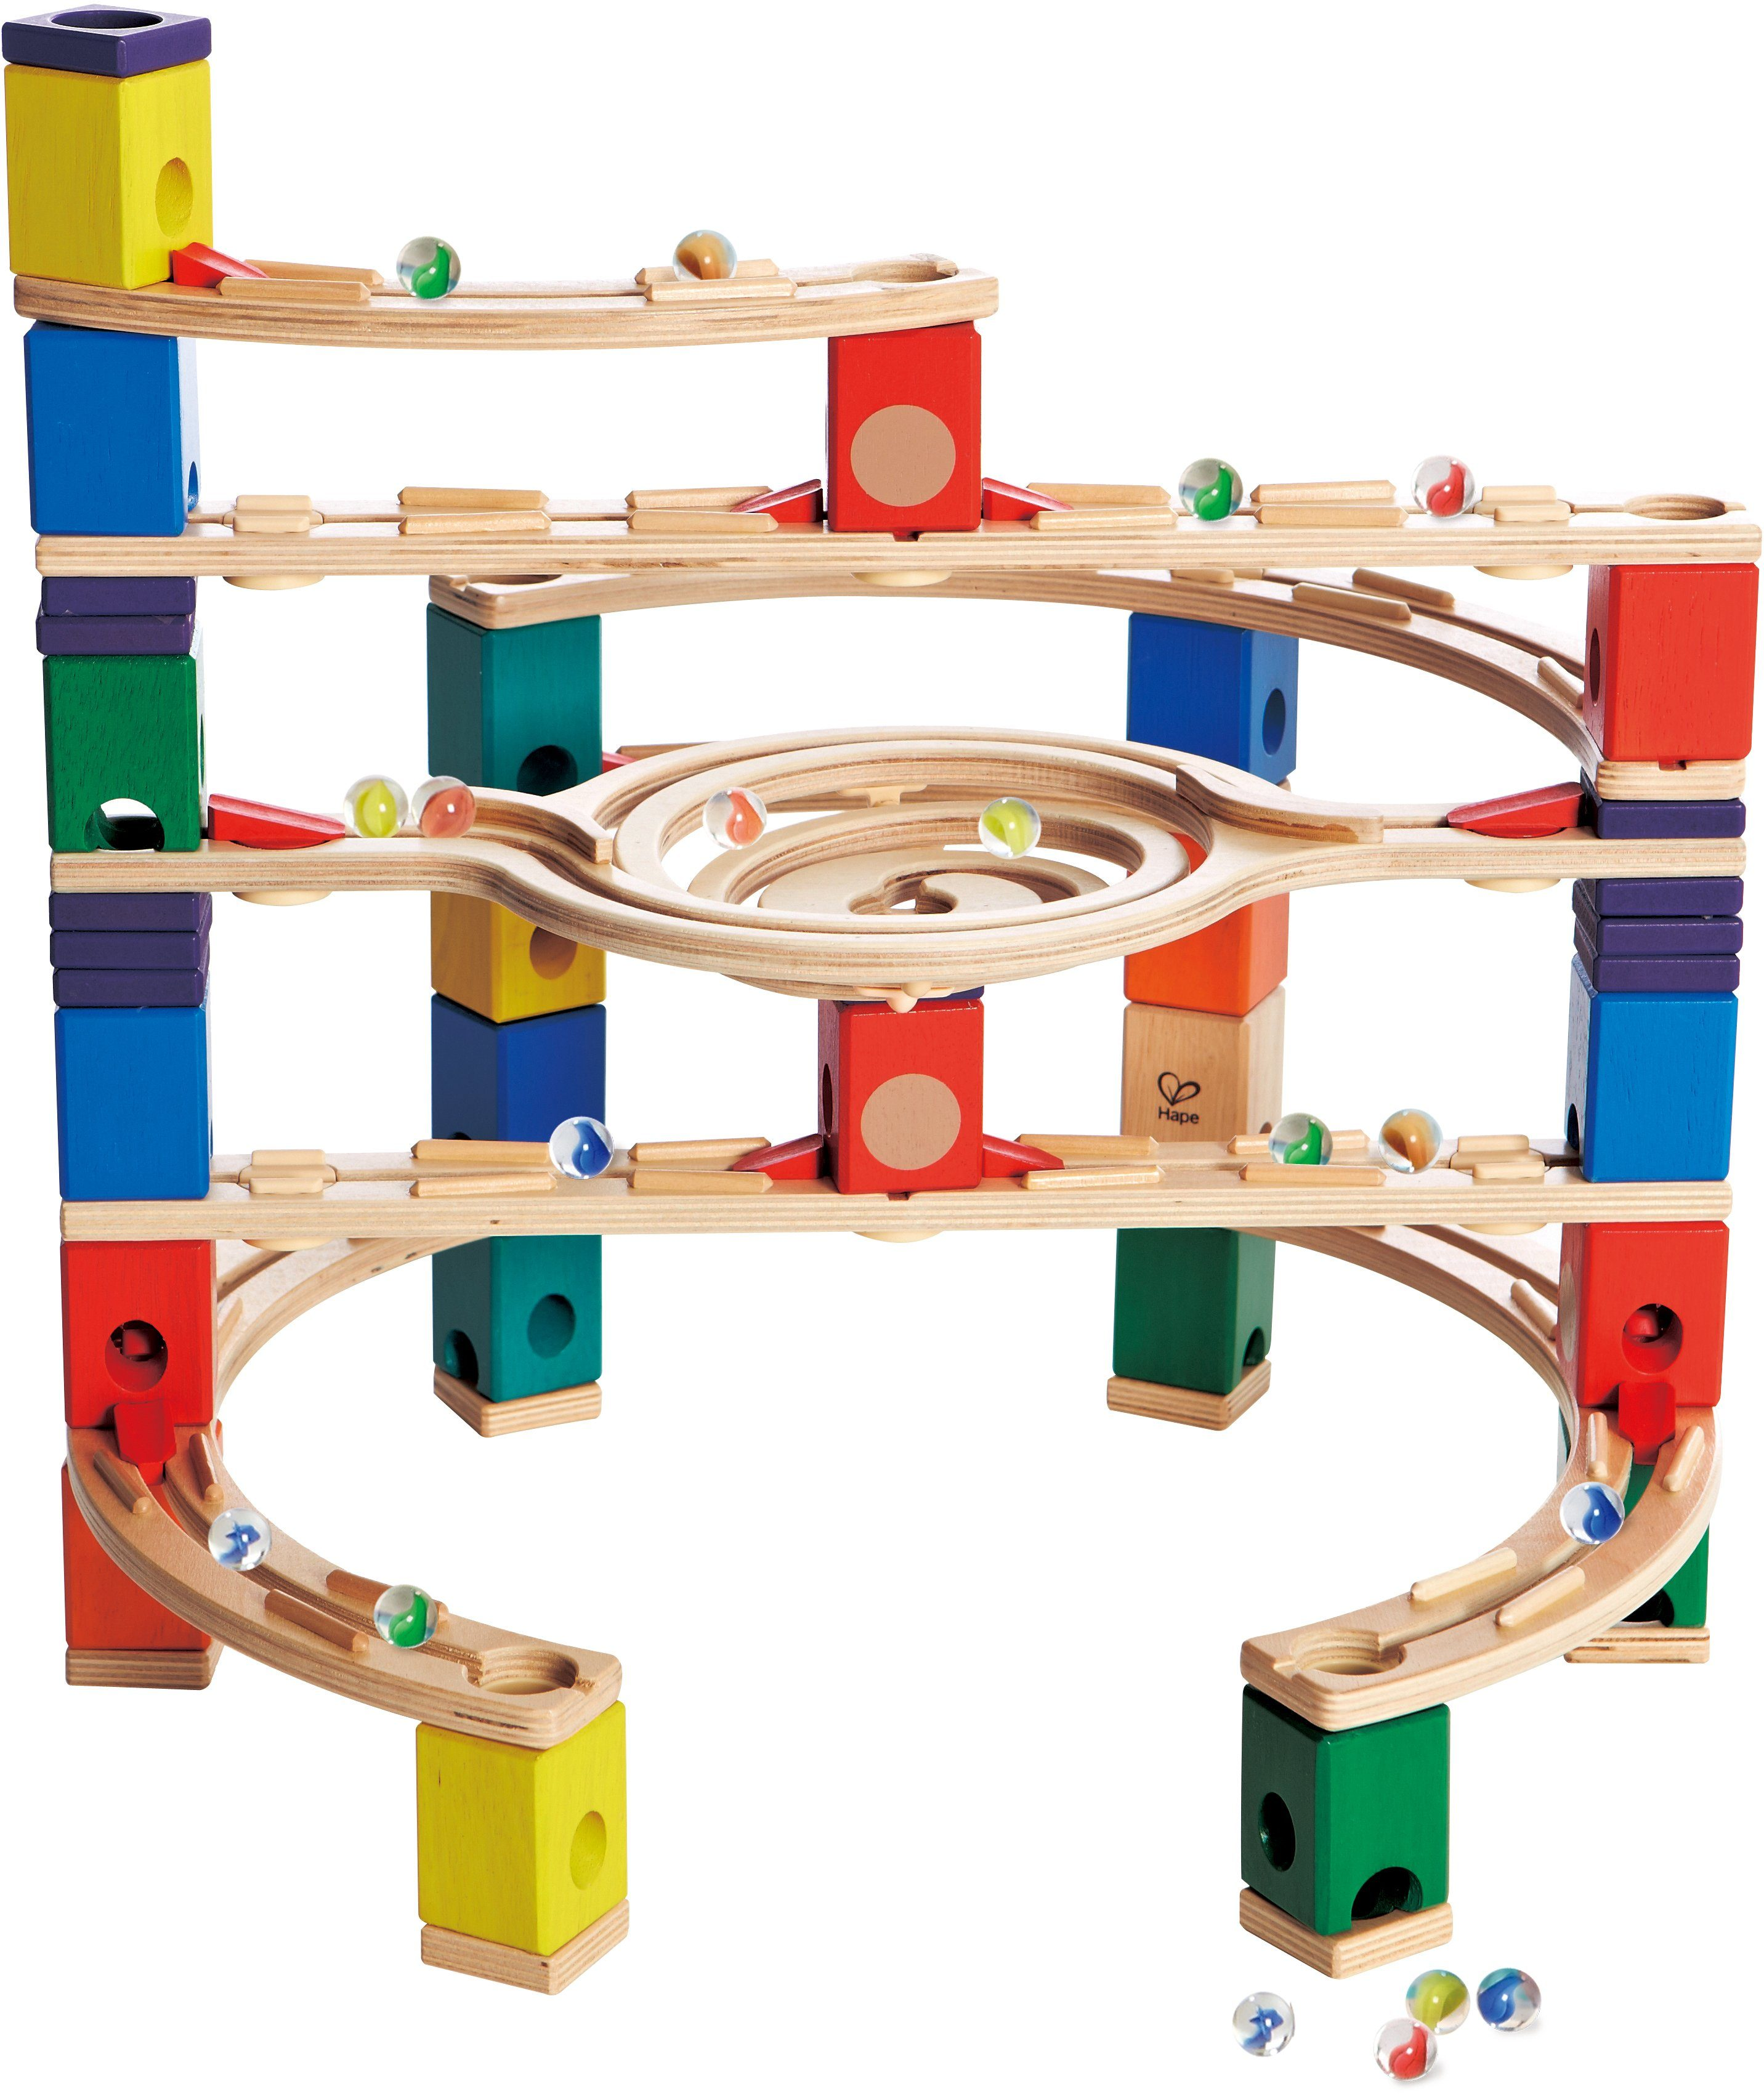 Hape Kugelbahn aus Holz, »Quadrilla Loop de Loop«